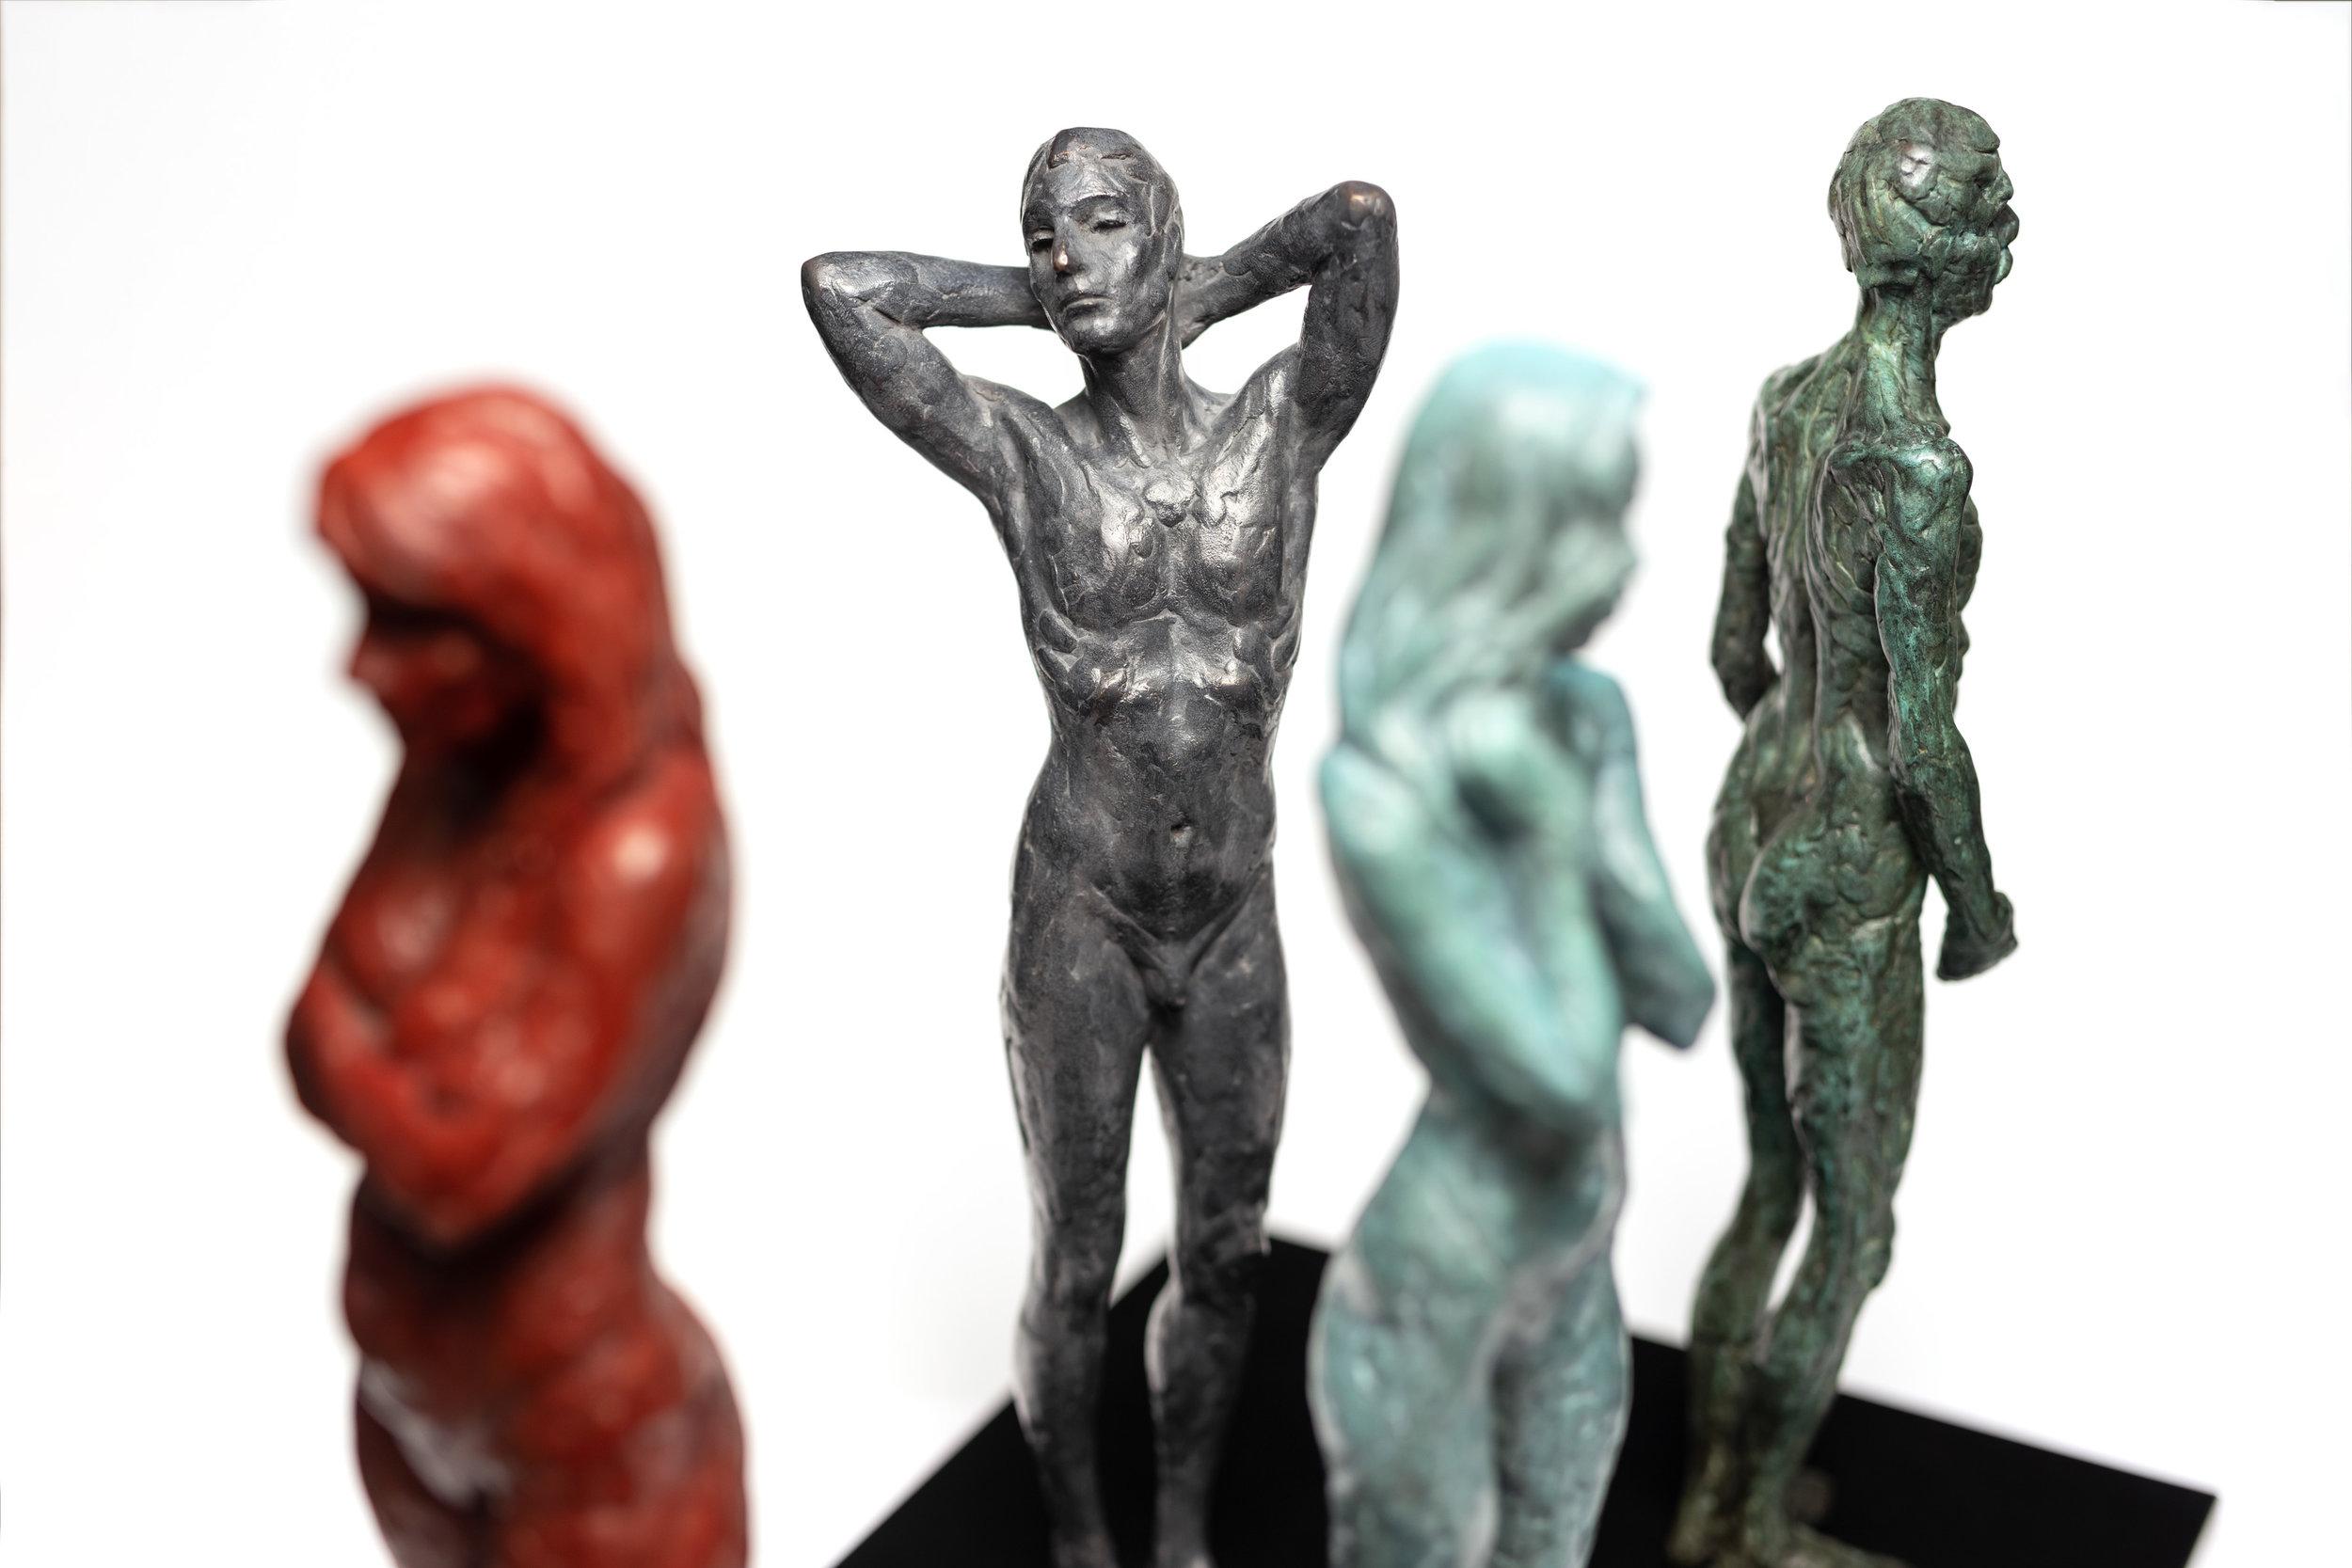 mf-figure-group-bronze-005.jpg